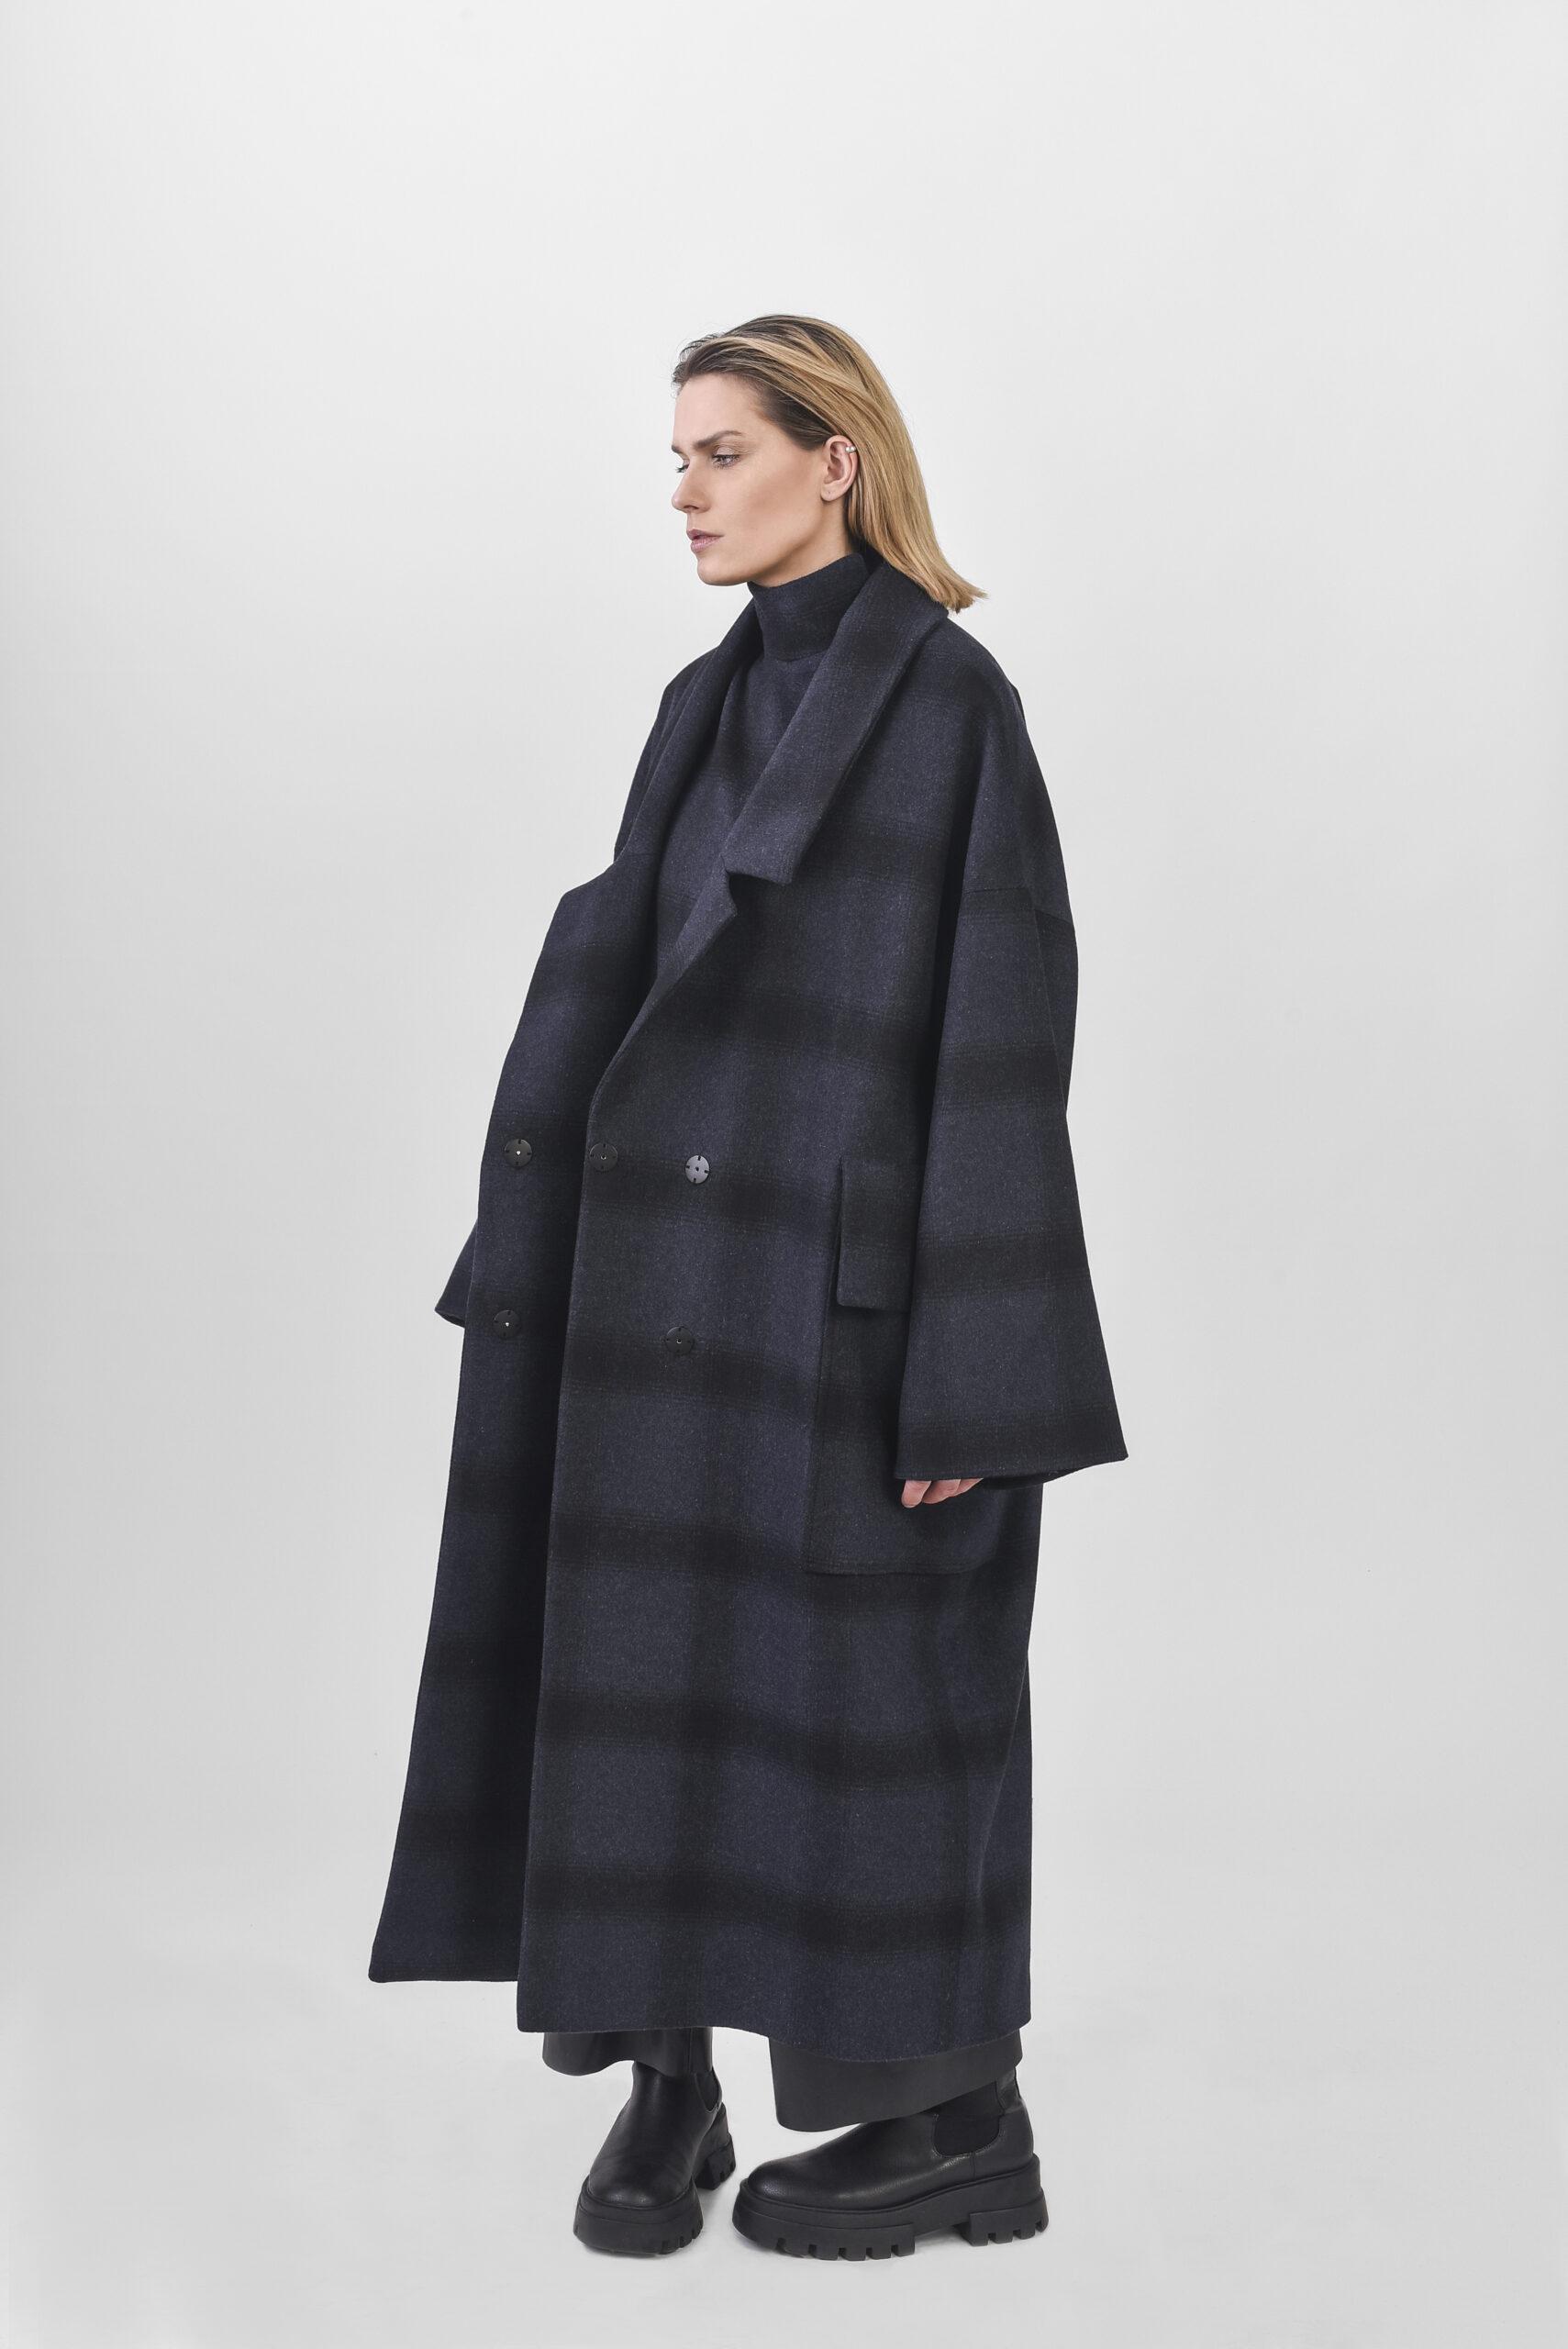 Deep, navy blue, plaid oversize coat, and vest duo